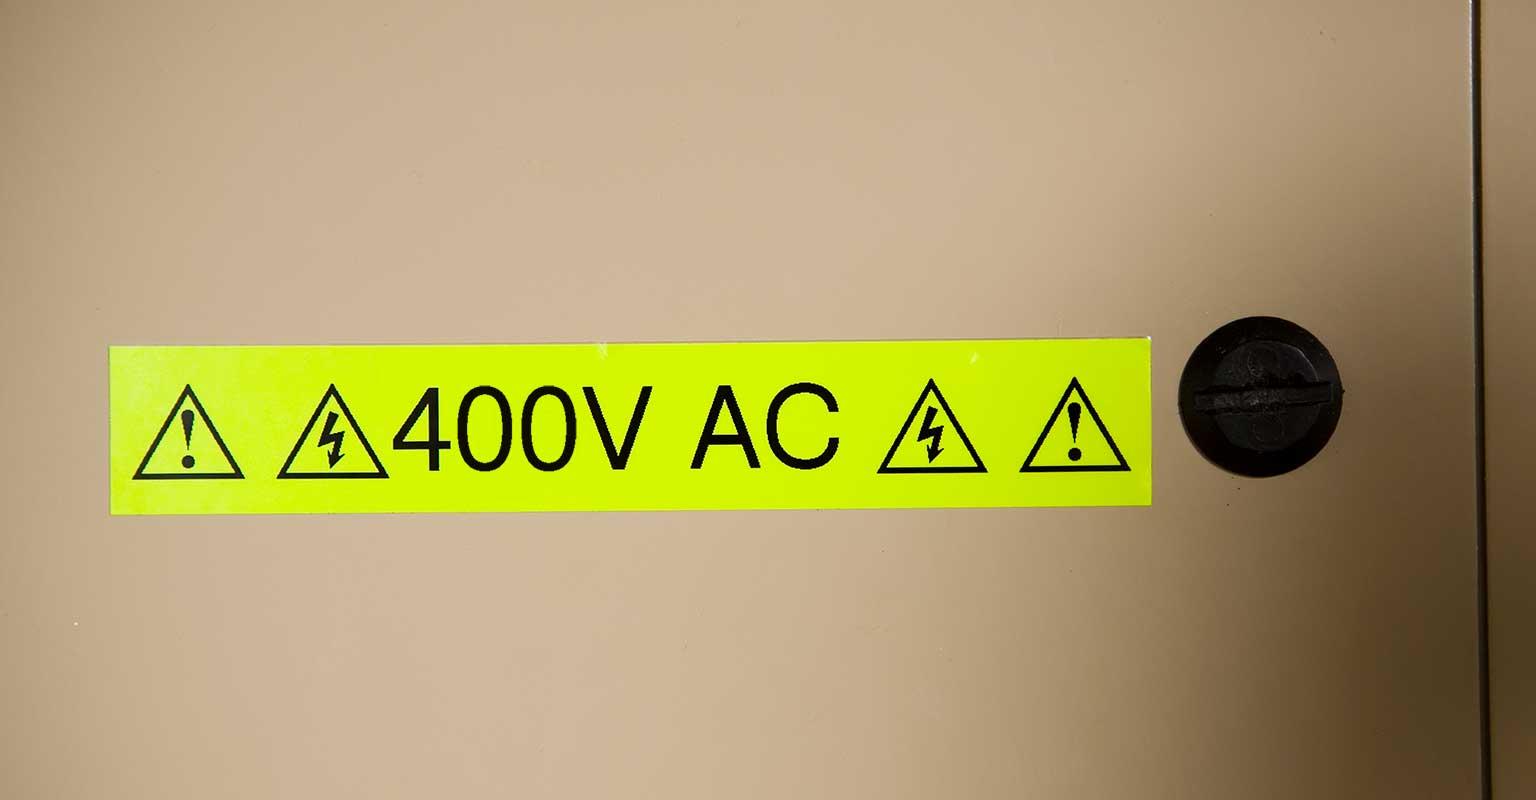 P-touch fluorescentni trak TZe z opozorilom glede napetosti